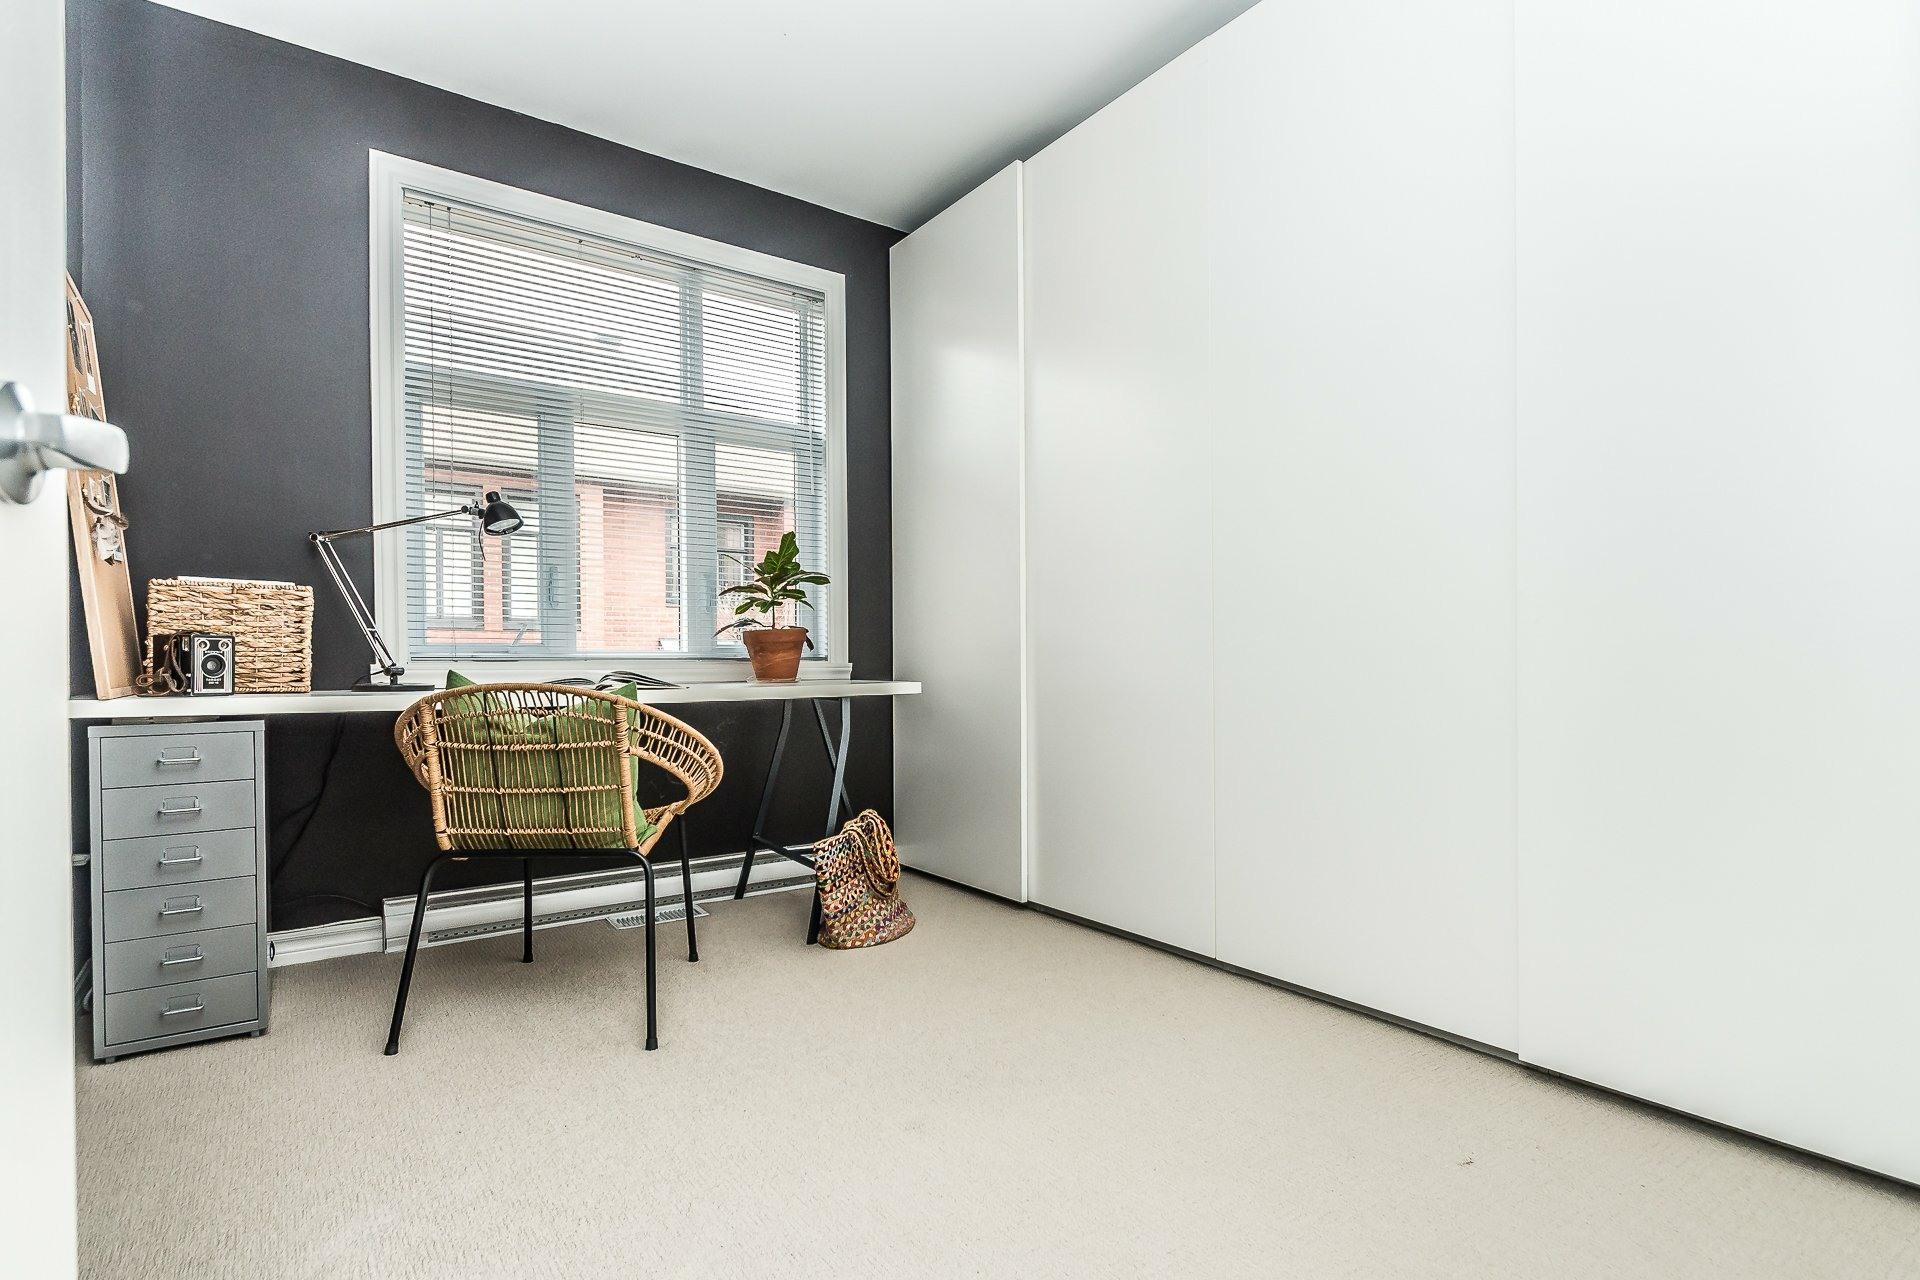 image 18 - MX - Casa sola - MX En venta Montréal Lachine  - 8 habitaciones